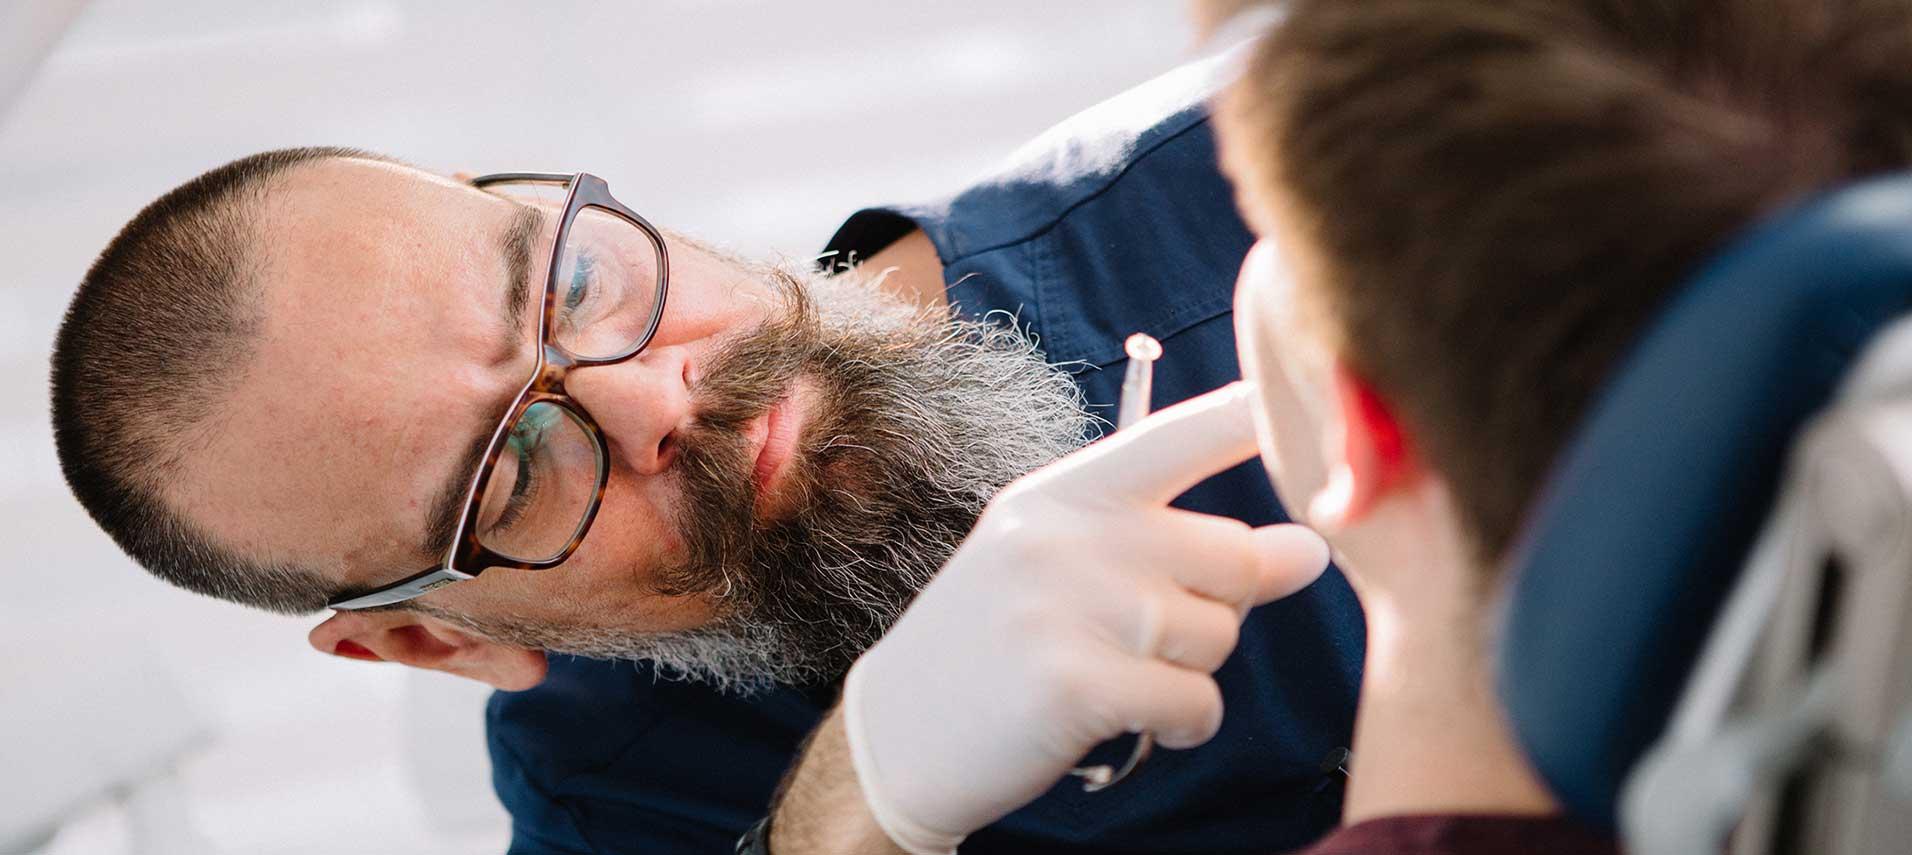 Stomatoloska ordinacija Vunjak dental clinic stomatolog pregled zuba